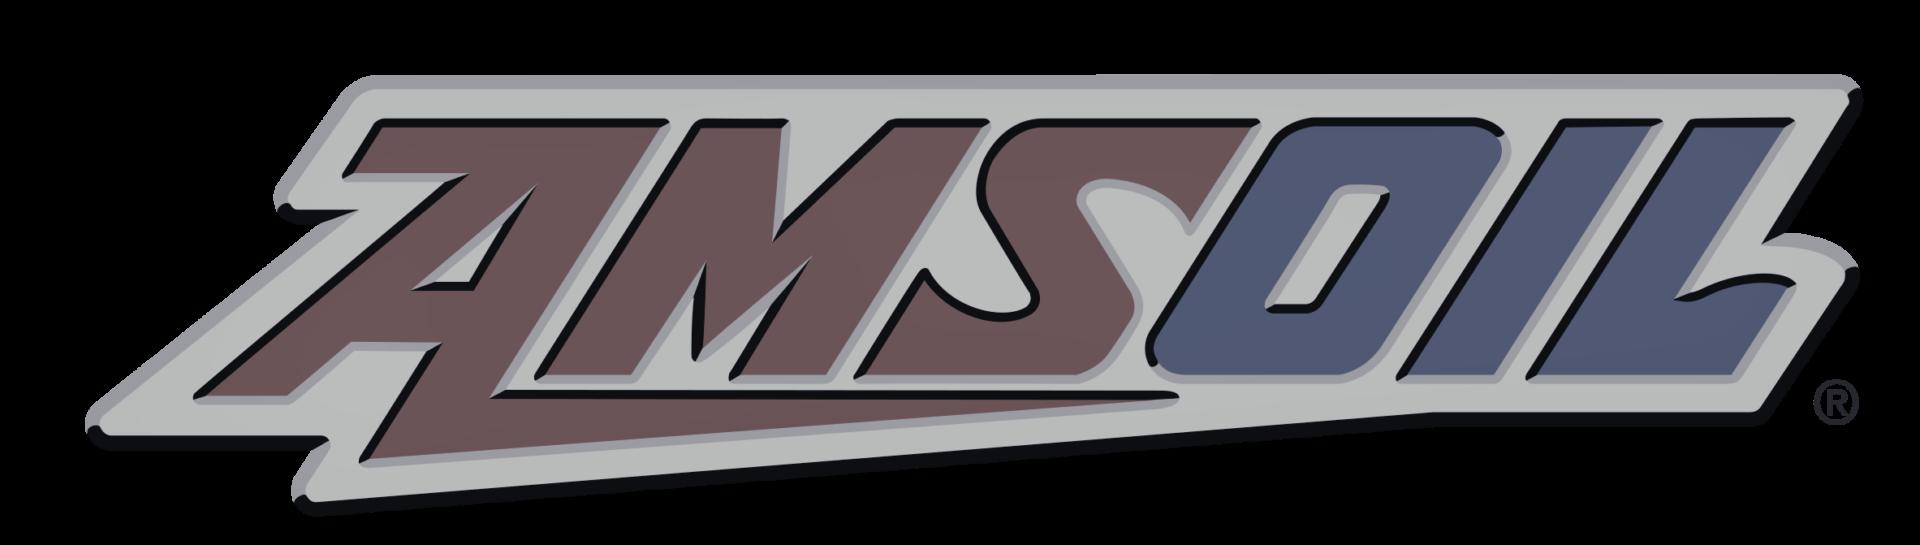 amsoil-1-logo-png-transparent (3)